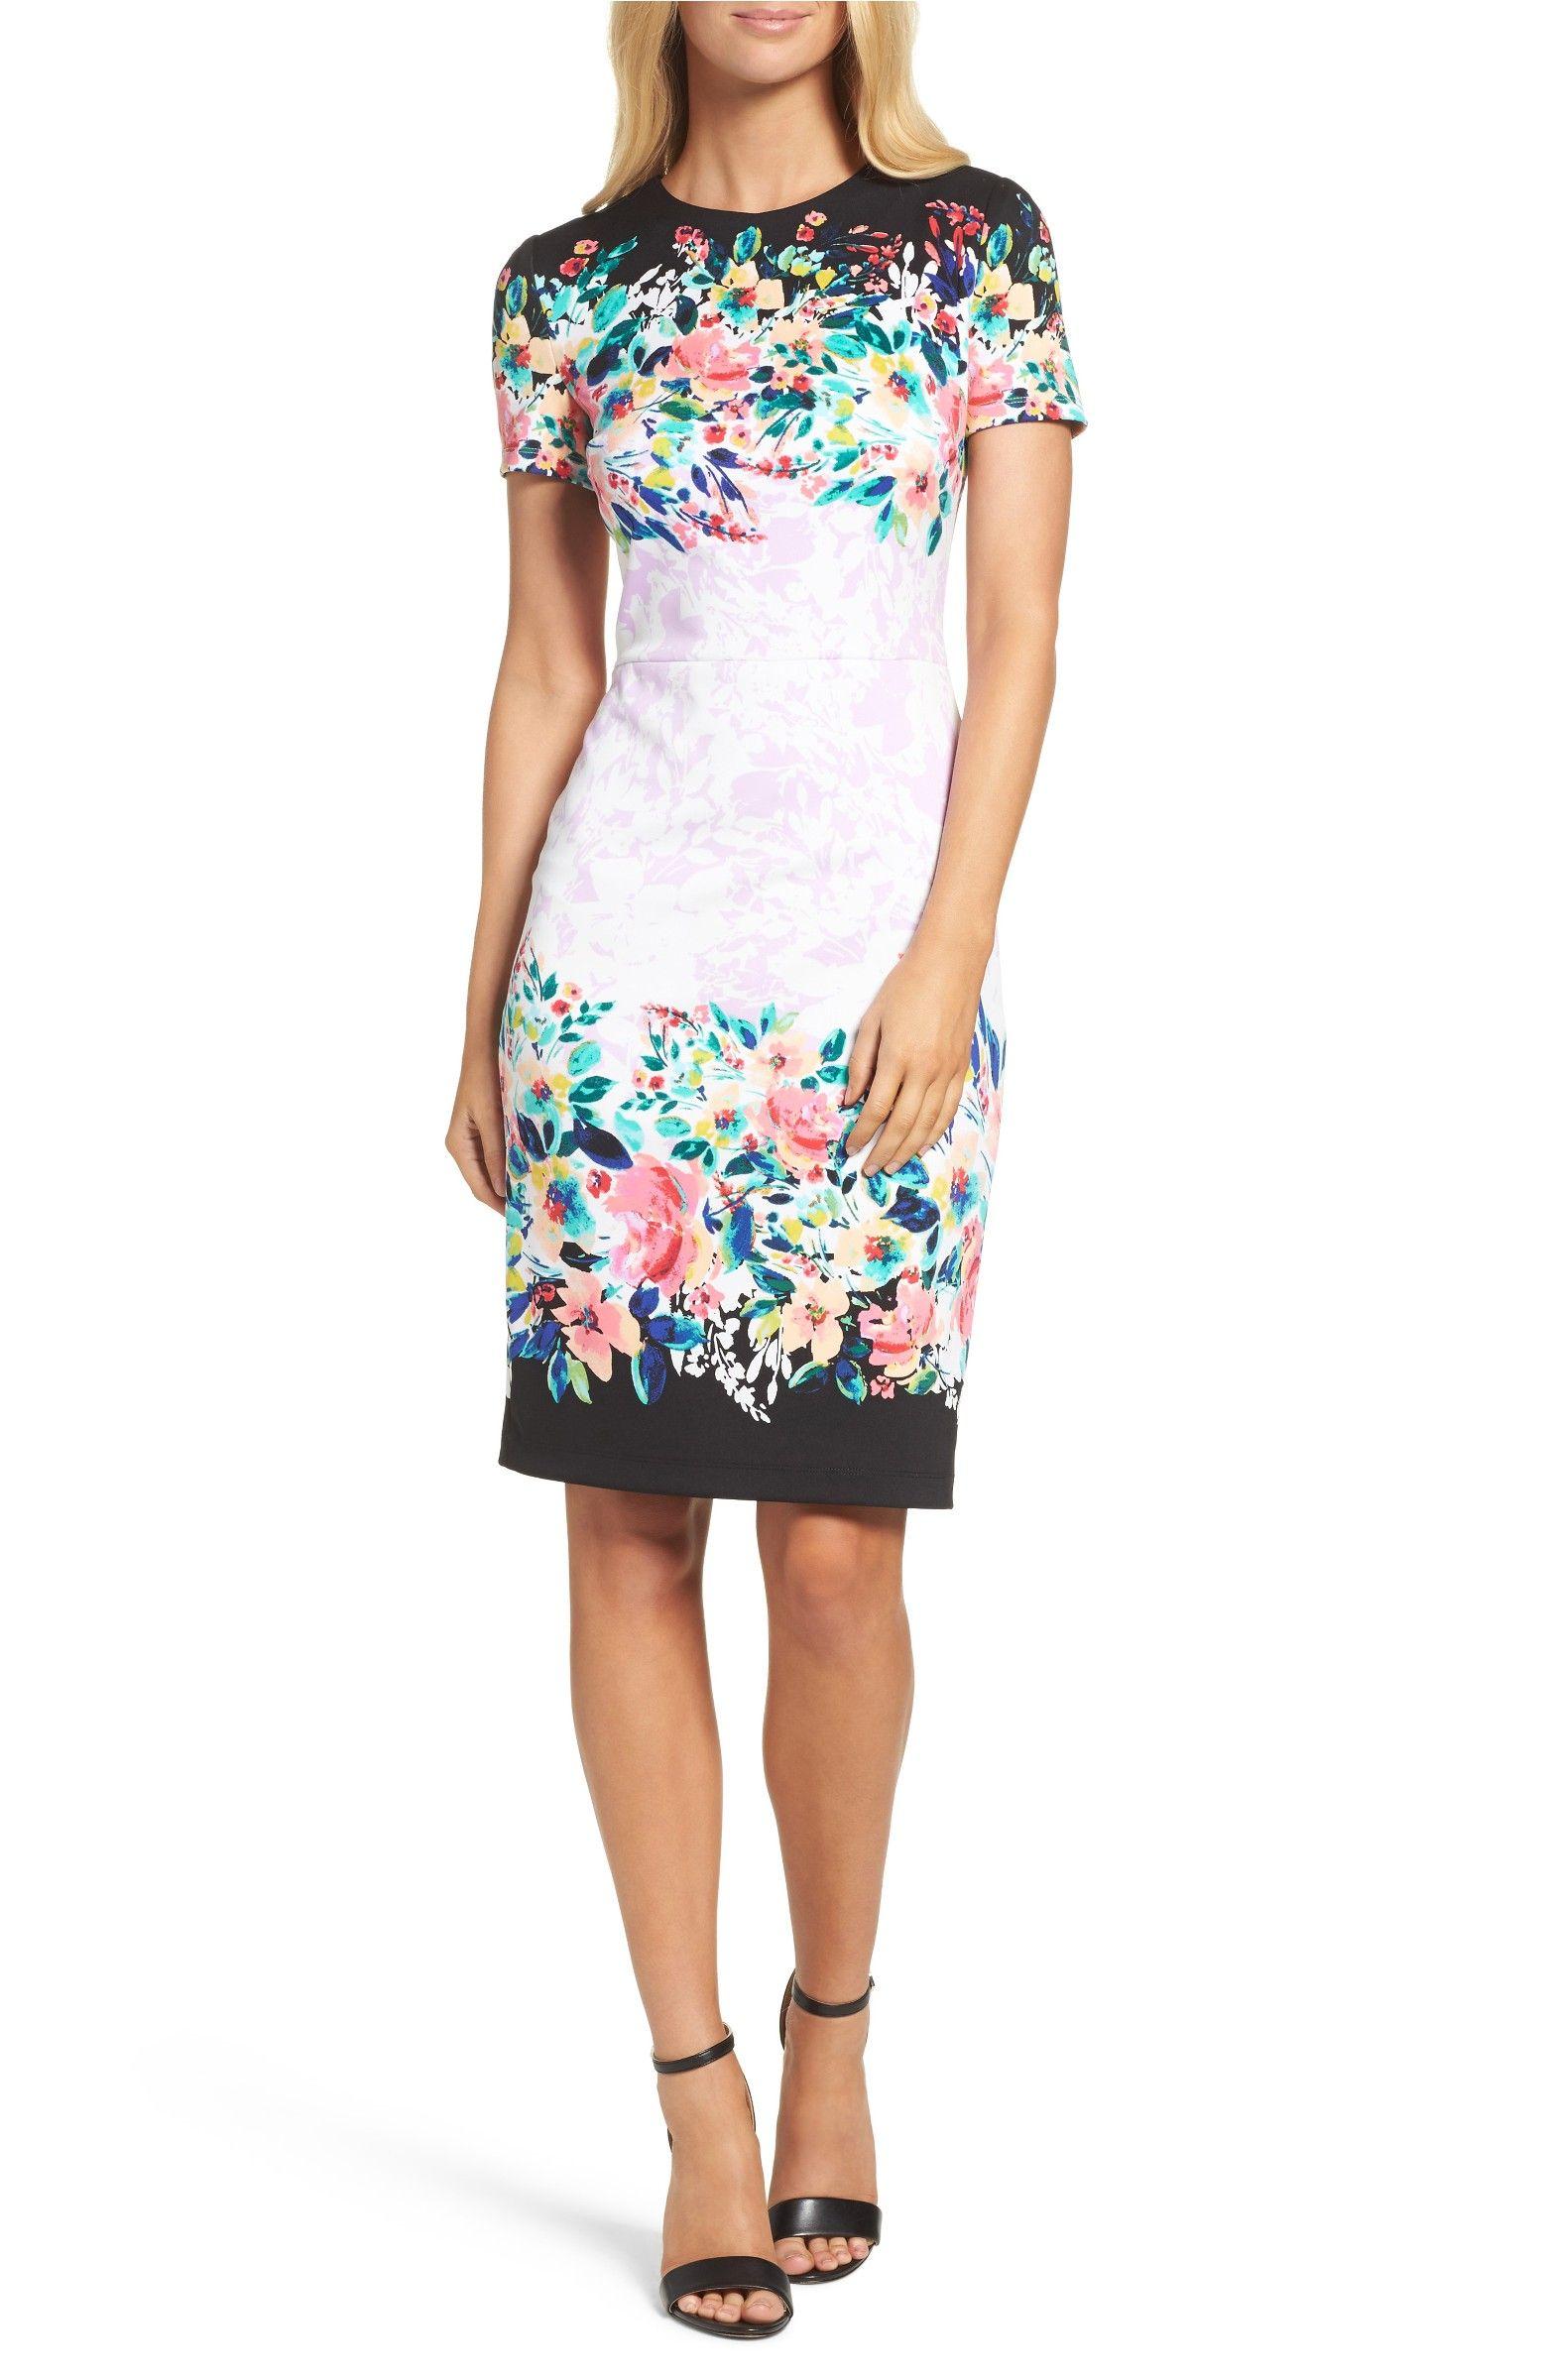 Maggy London Floral Print Scuba Dress Stripes Fashion Dress Dress Clothes For Women Scuba Dress